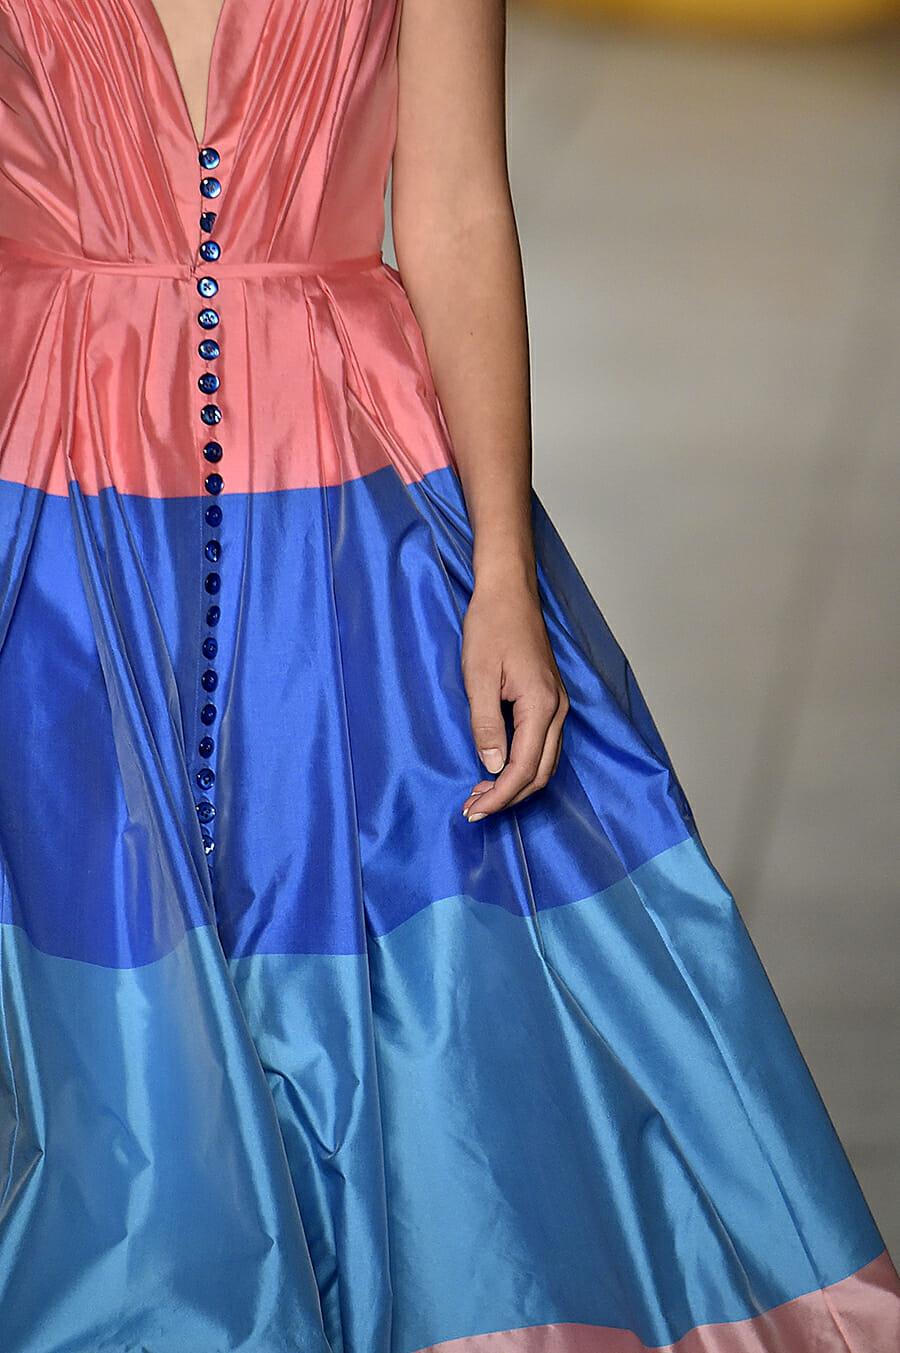 Carolina-Herrera-New-York-Fashion-Week-Spring-Summer-2018-NY-September-2017-look43-detail3